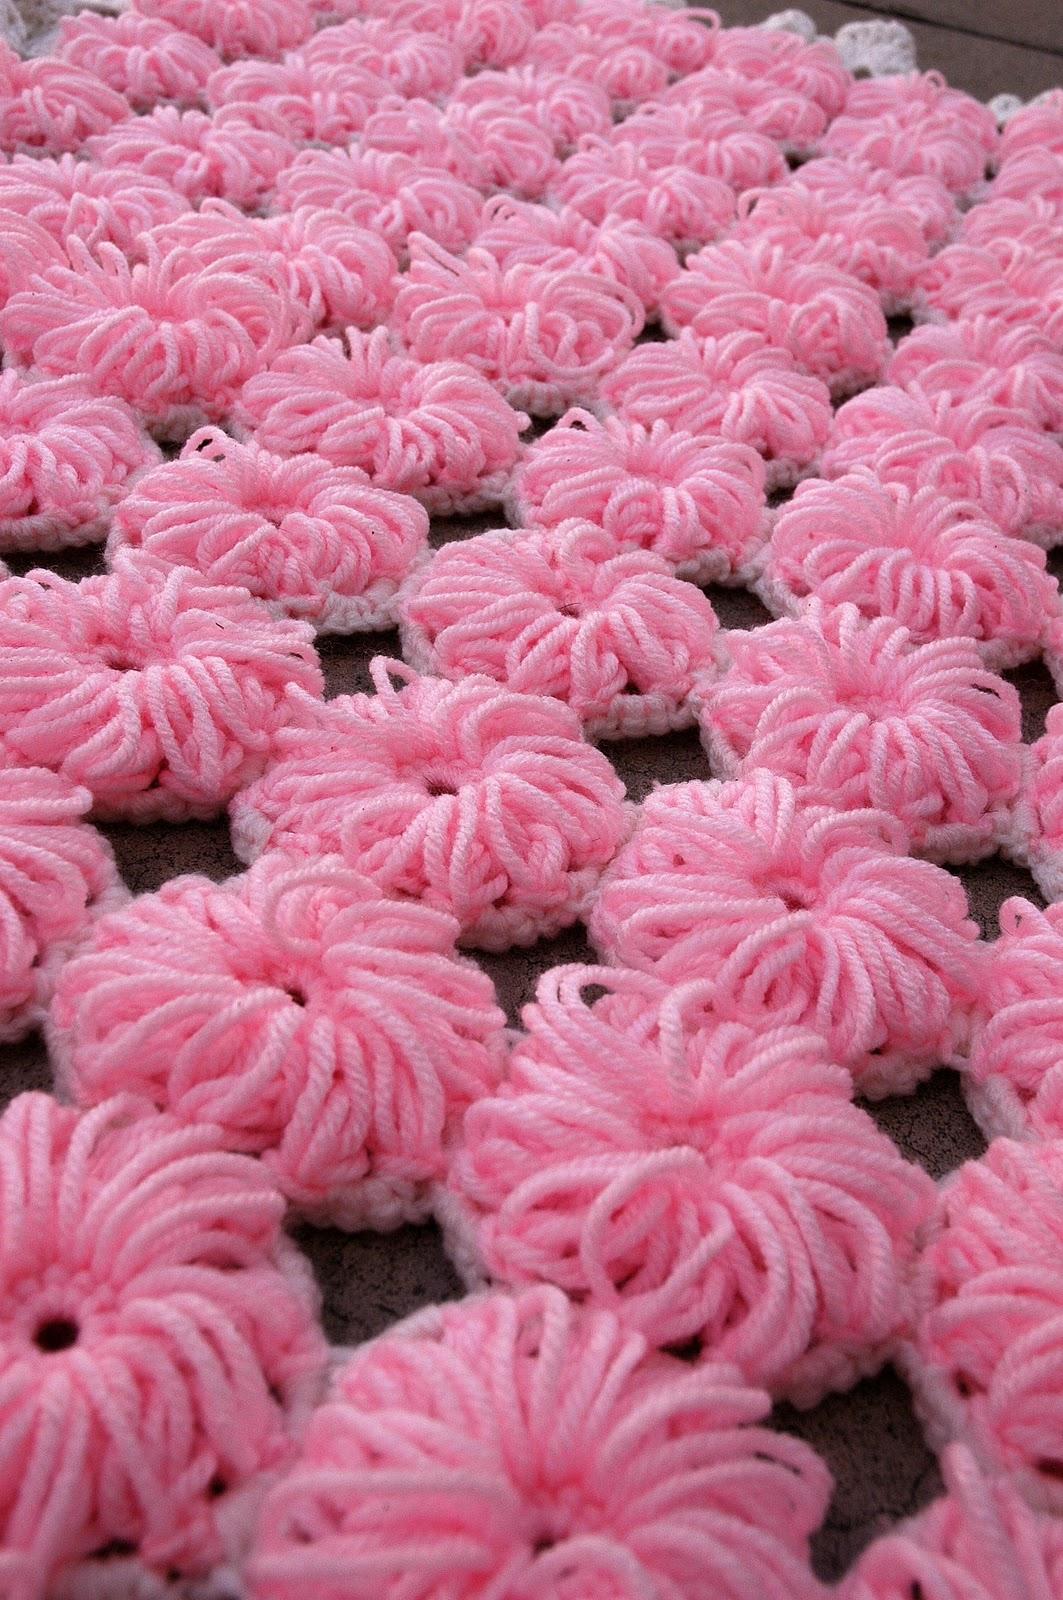 Vintage Crochet Patterns Baby Blankets : julies blog: Vintage Crochet Baby Blanket